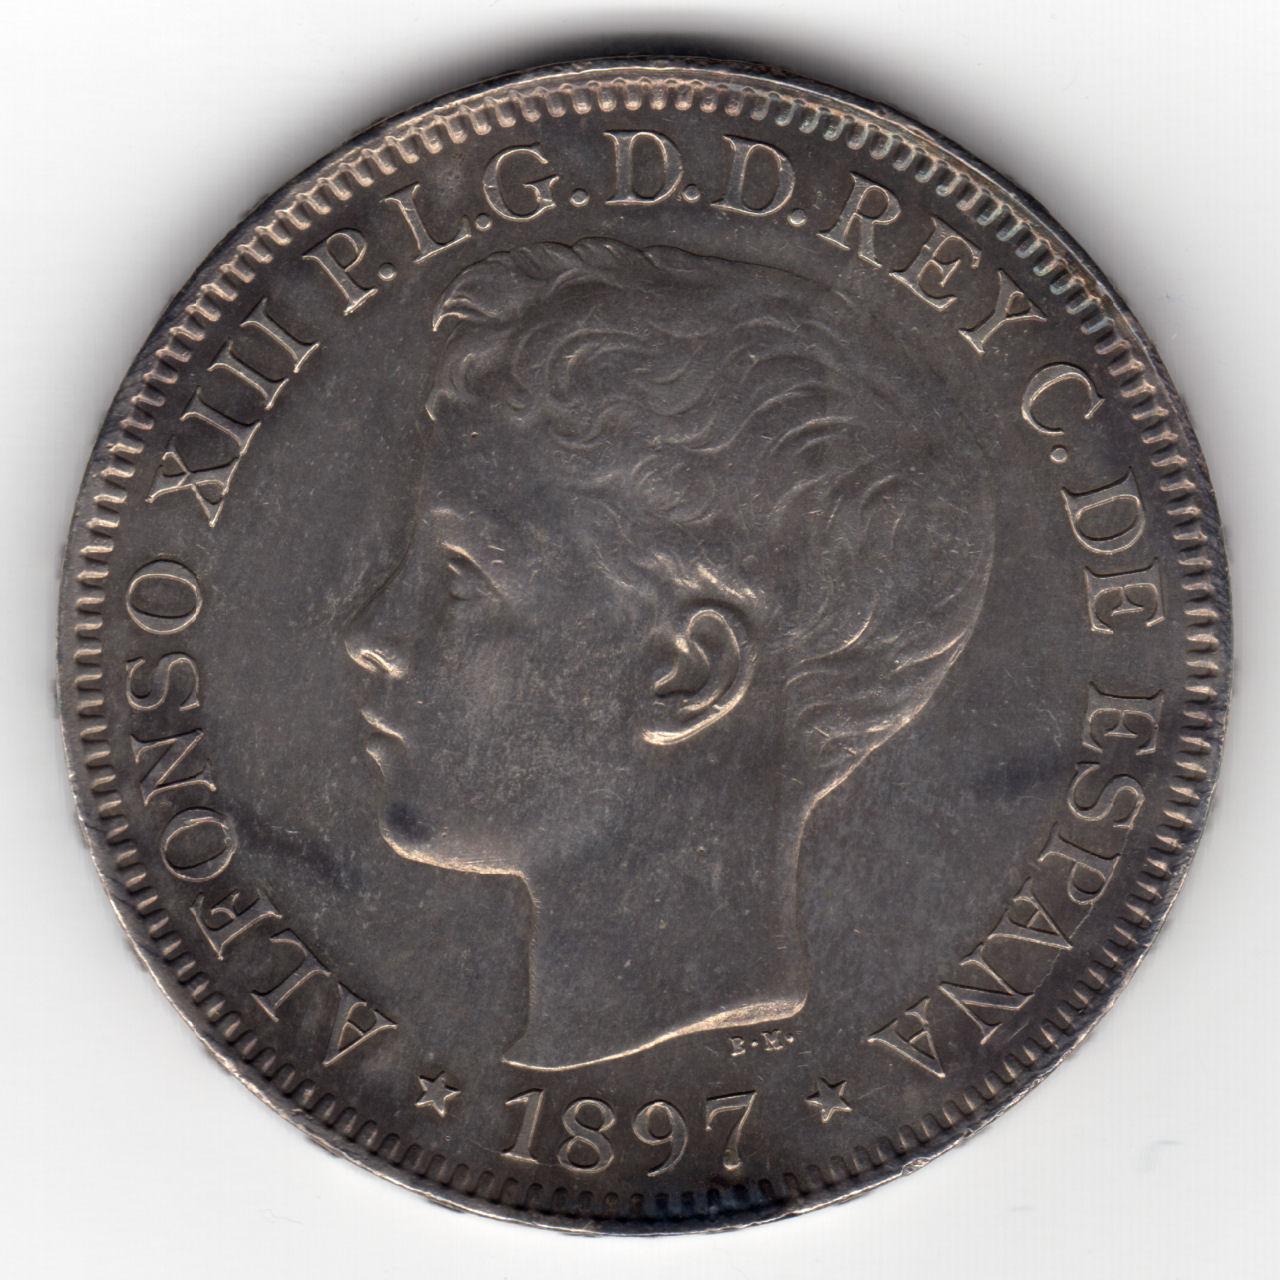 Pichori フィリピンの硬貨 1897...